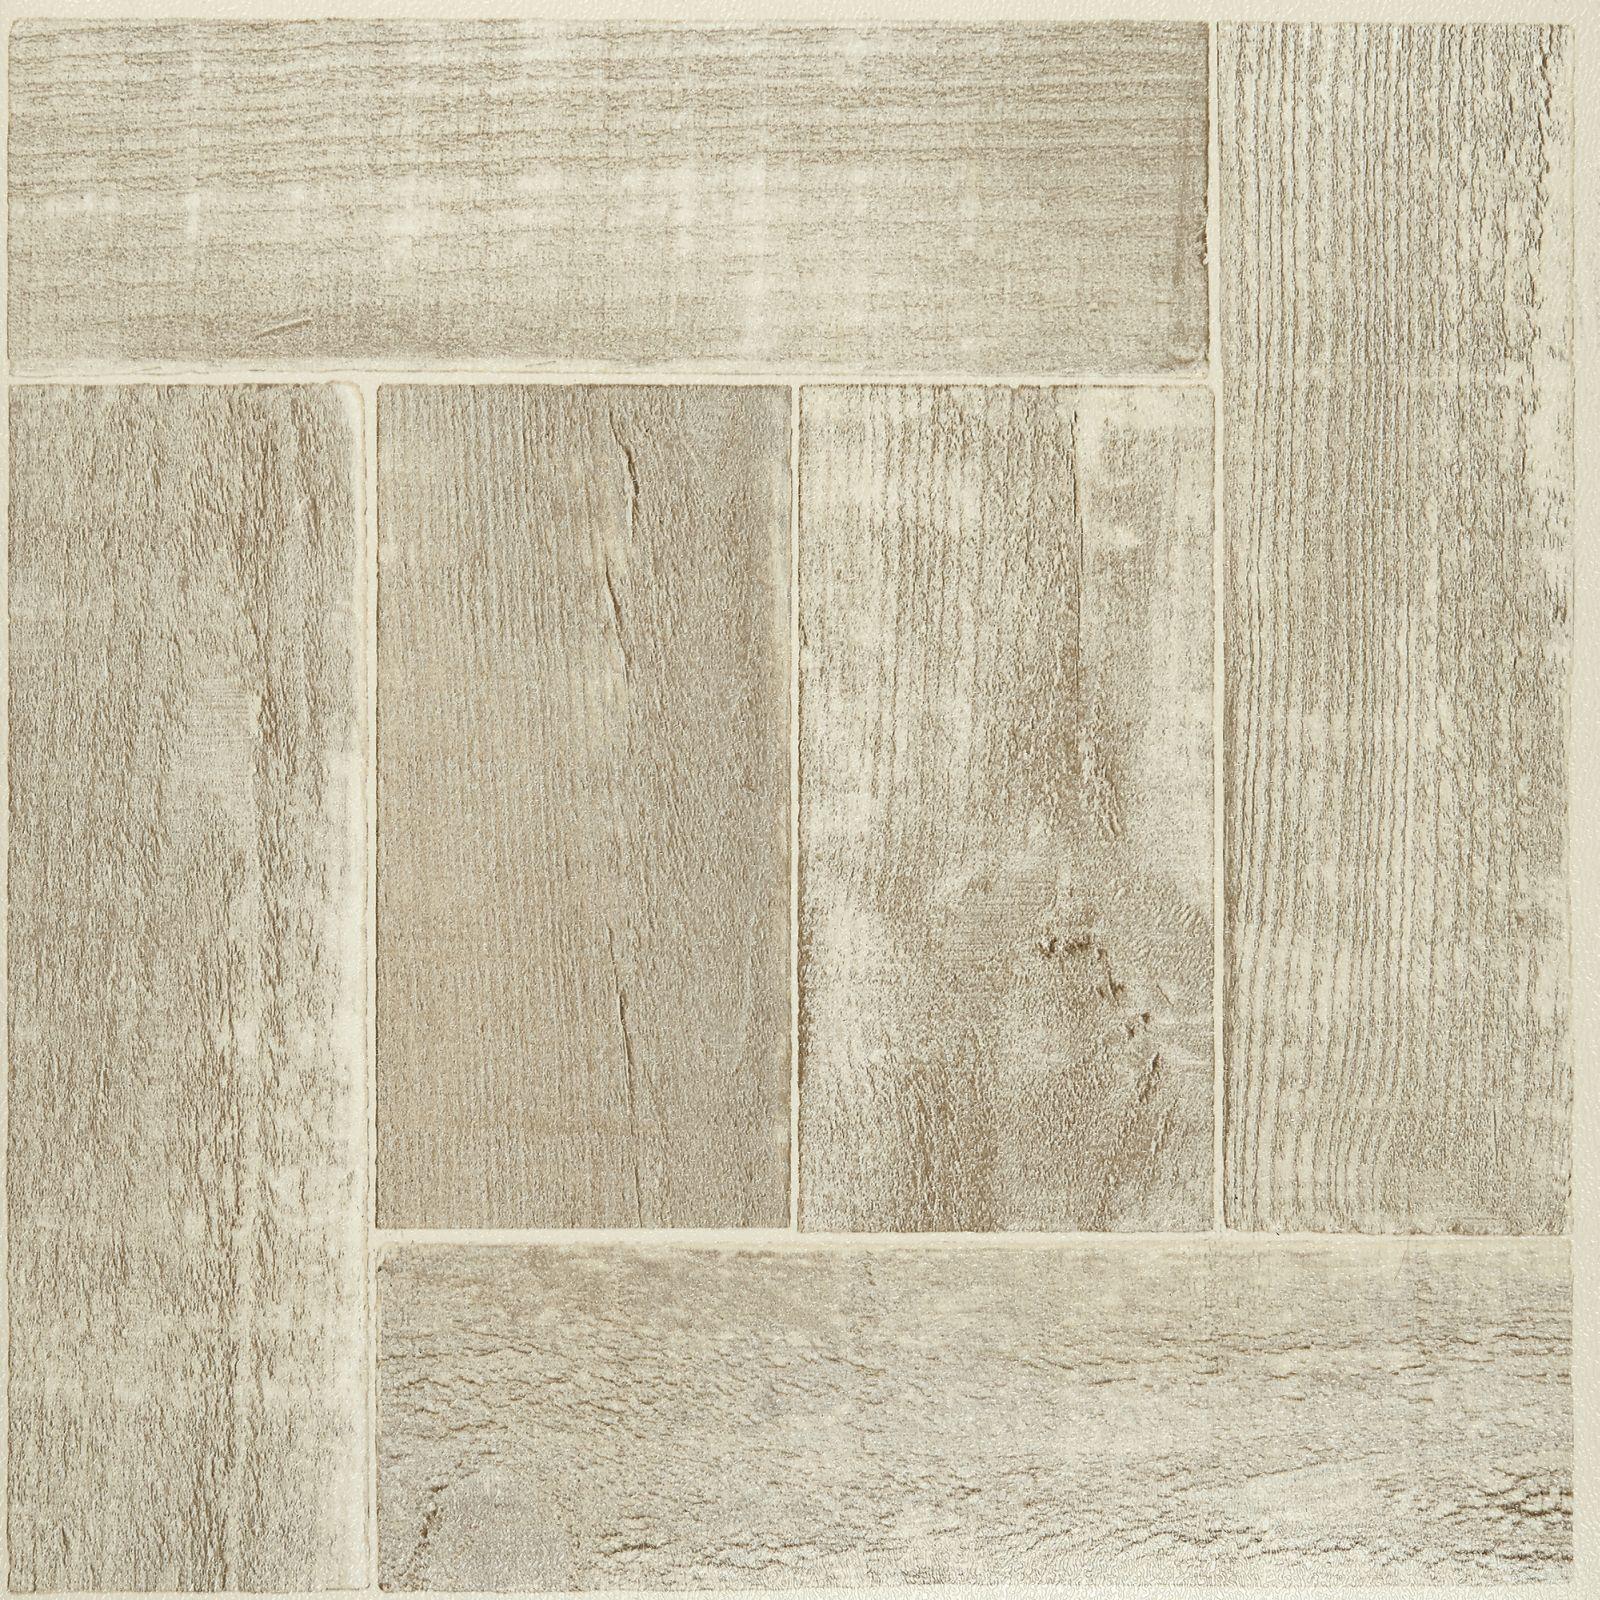 Achim nexus saddlewood 12x12 self adhesive vinyl floor tile 20 achim nexus saddlewood 12x12 self adhesive vinyl floor tile 20 tiles20 sq ft dailygadgetfo Images